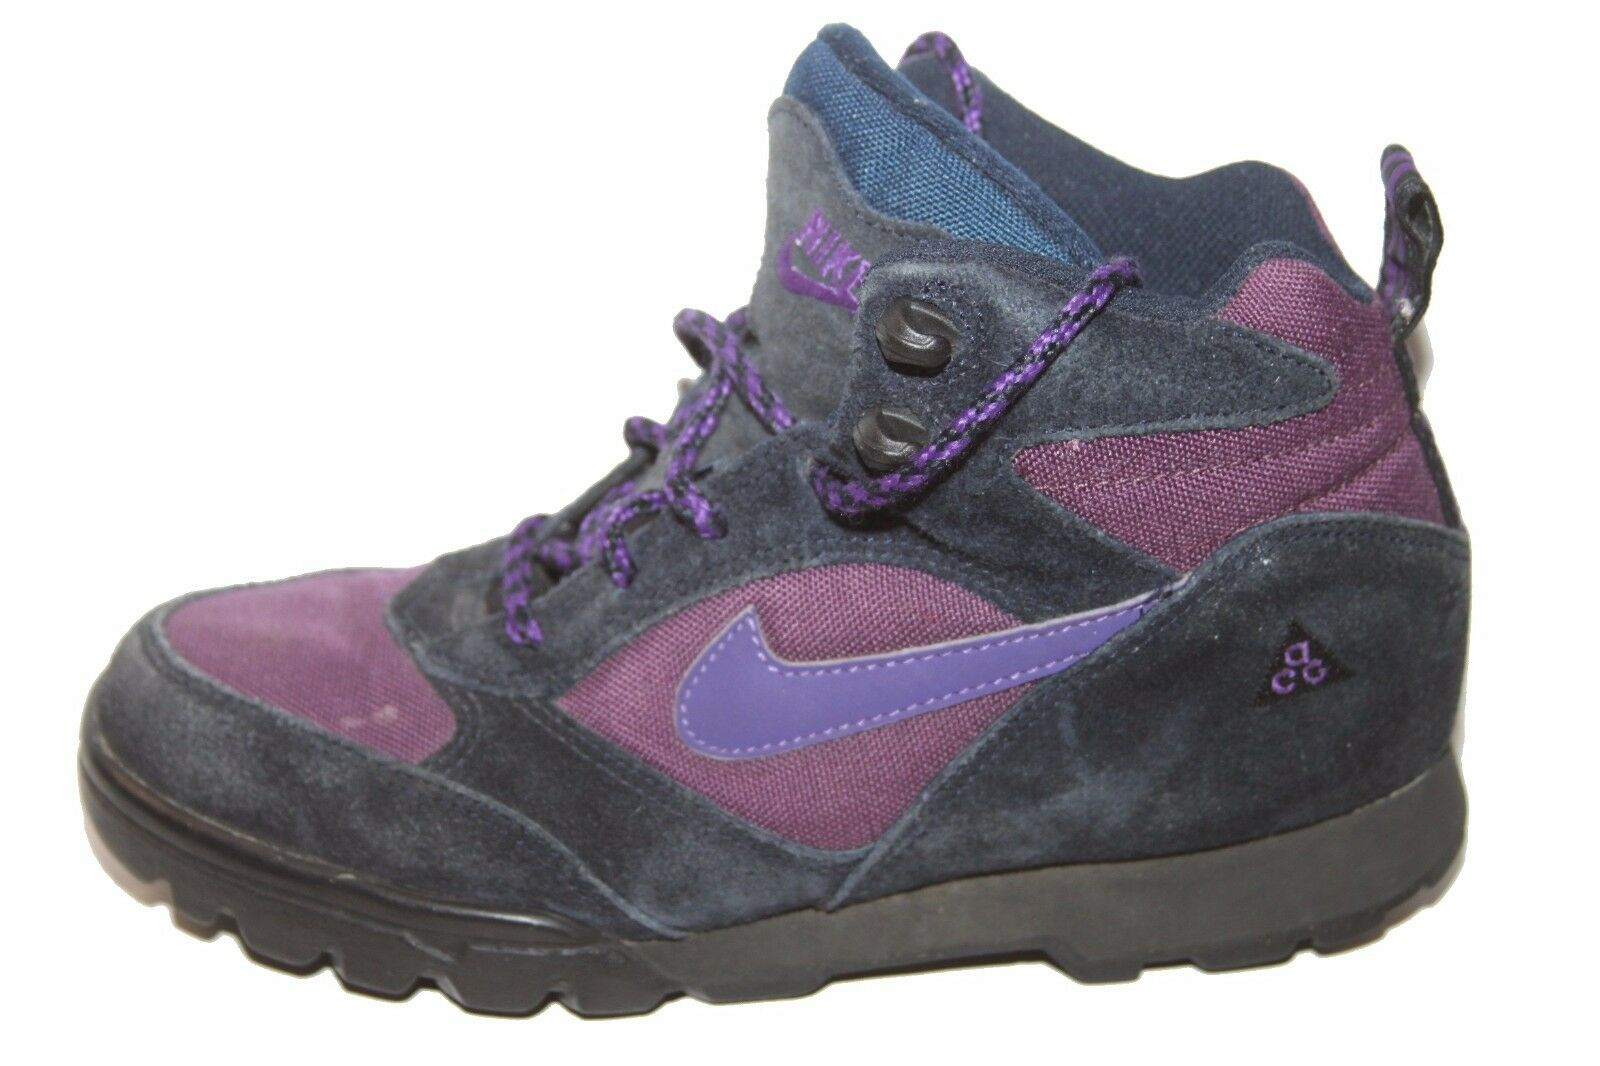 Vintage Nike Trail 1995 185054-552 Purple/Navy ACG Trail Nike Hightops Sz 8 Preowned 14ca00